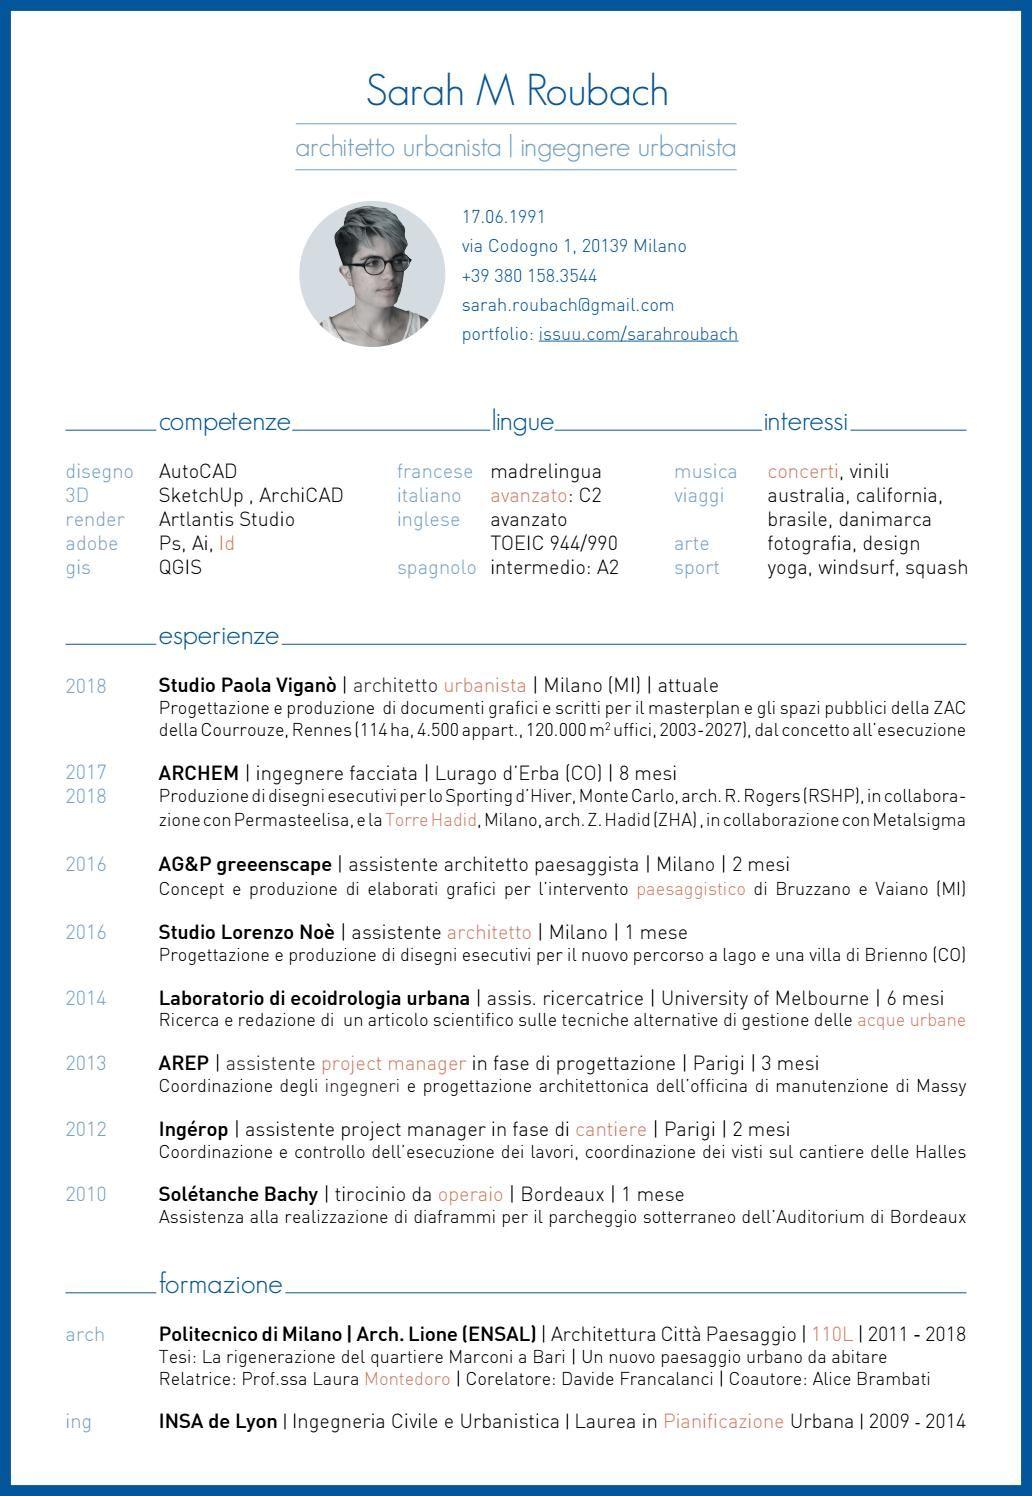 Sarah Roubach Curriculum Vitae 2018 Italiano